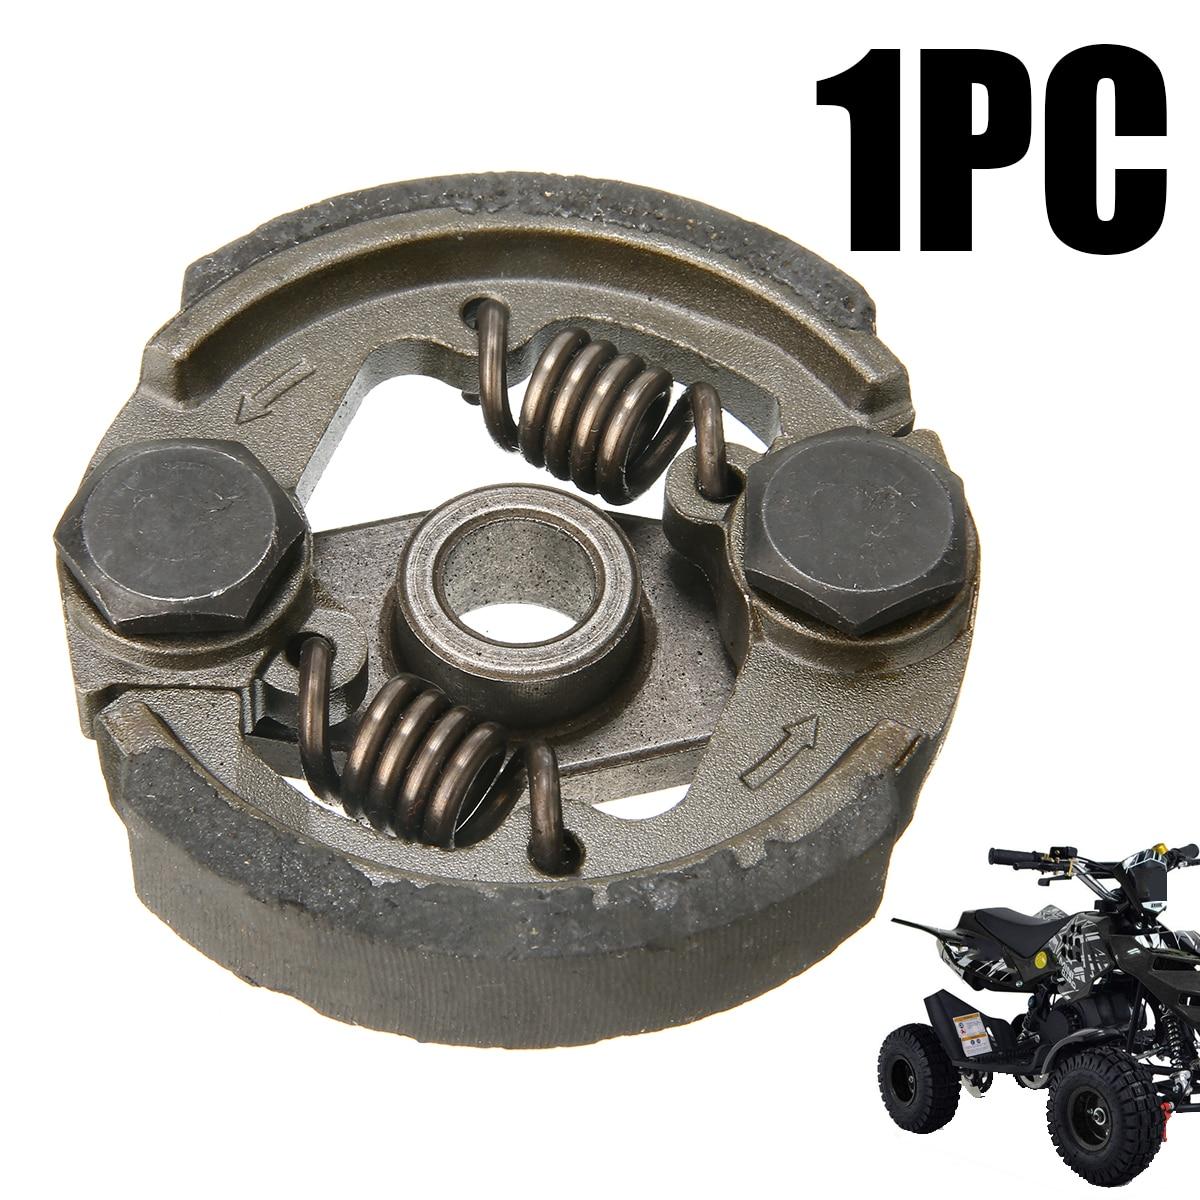 2 Mini Pocket Bike Performance Race Clutch Minimoto ATV Dirt Bike 49cc Dirtbike